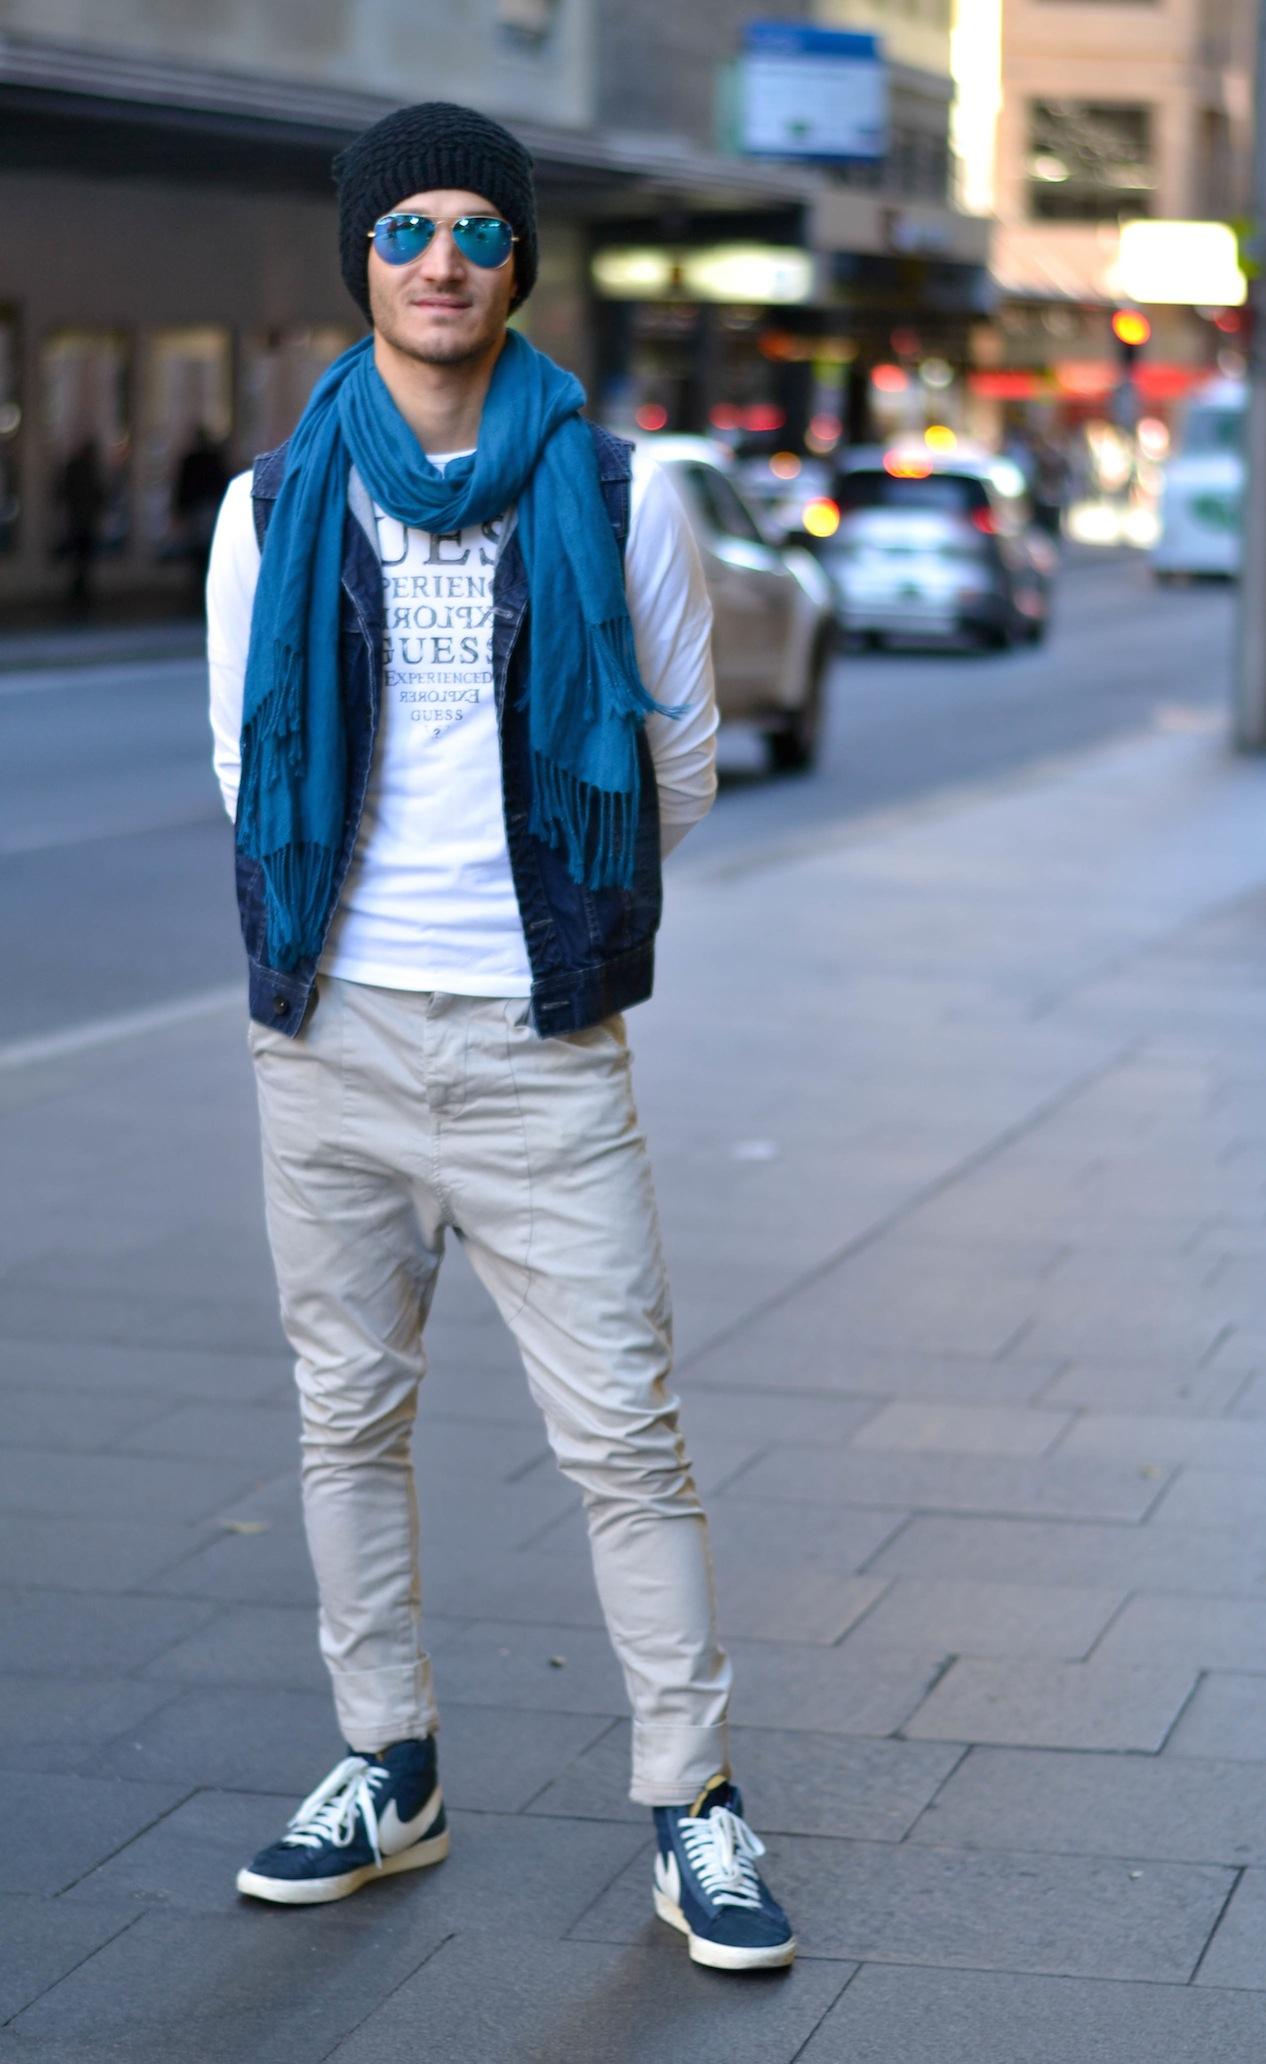 NSW: Toscan Luca, musician, Castelreagh St, Sydney. Photo: Alice Scriberras.